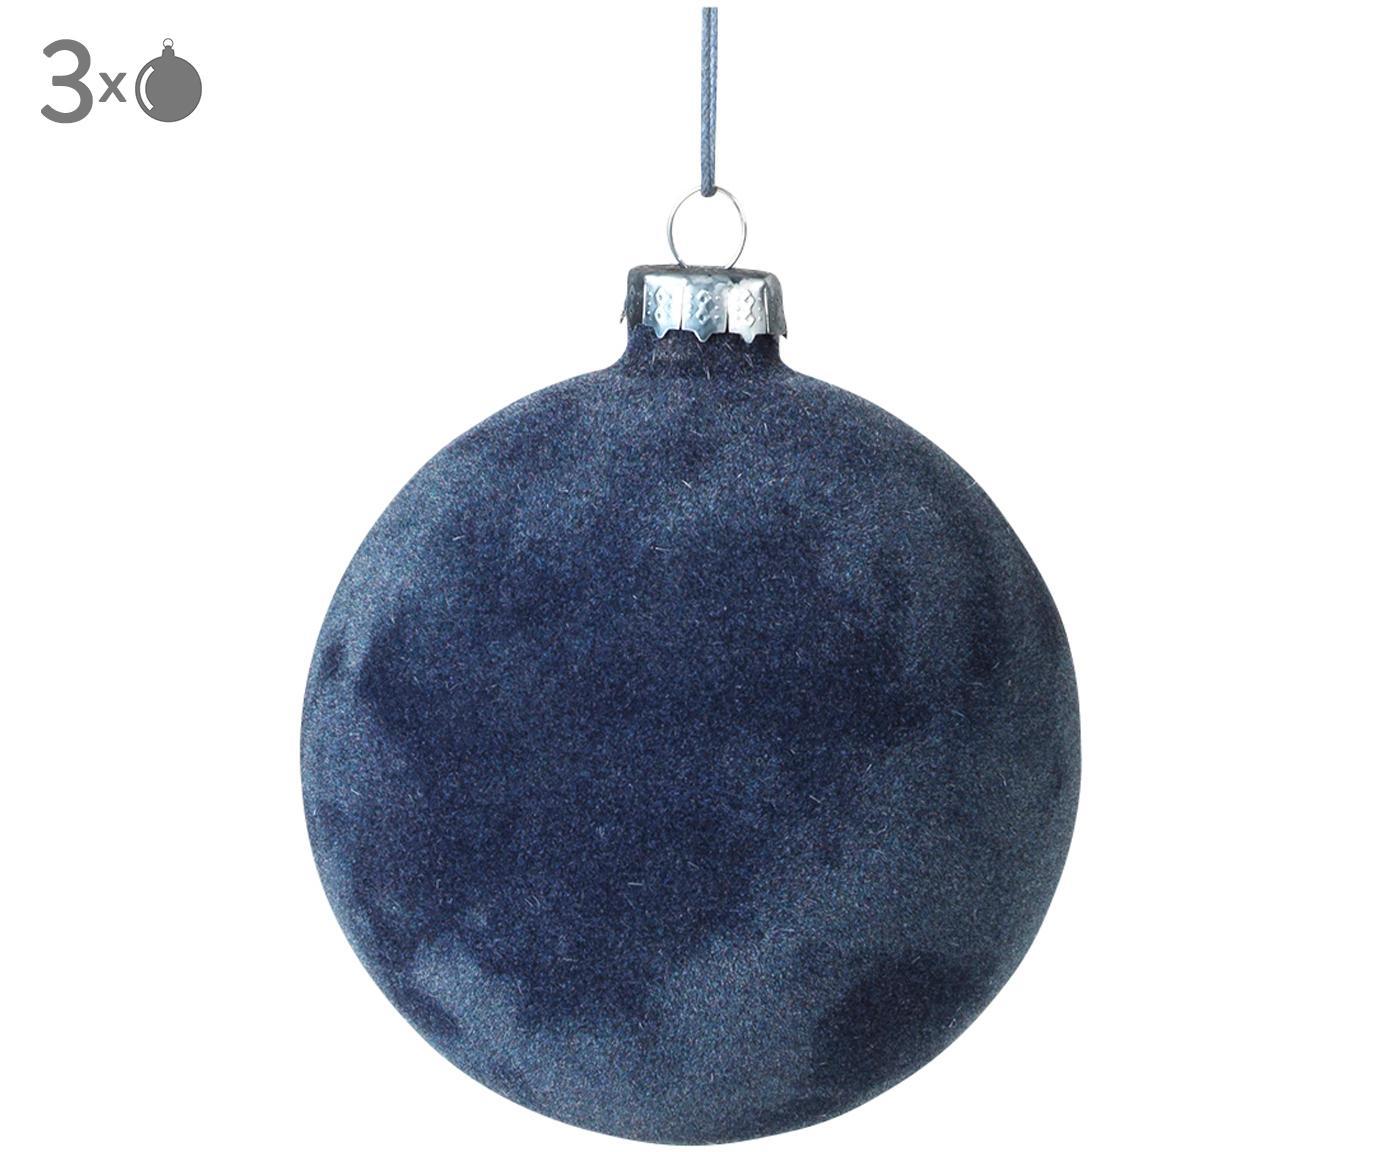 Palline di Natale Alcan, 3 pz., Vetro, velluto di poliestere, Blu scuro, Ø 10 cm